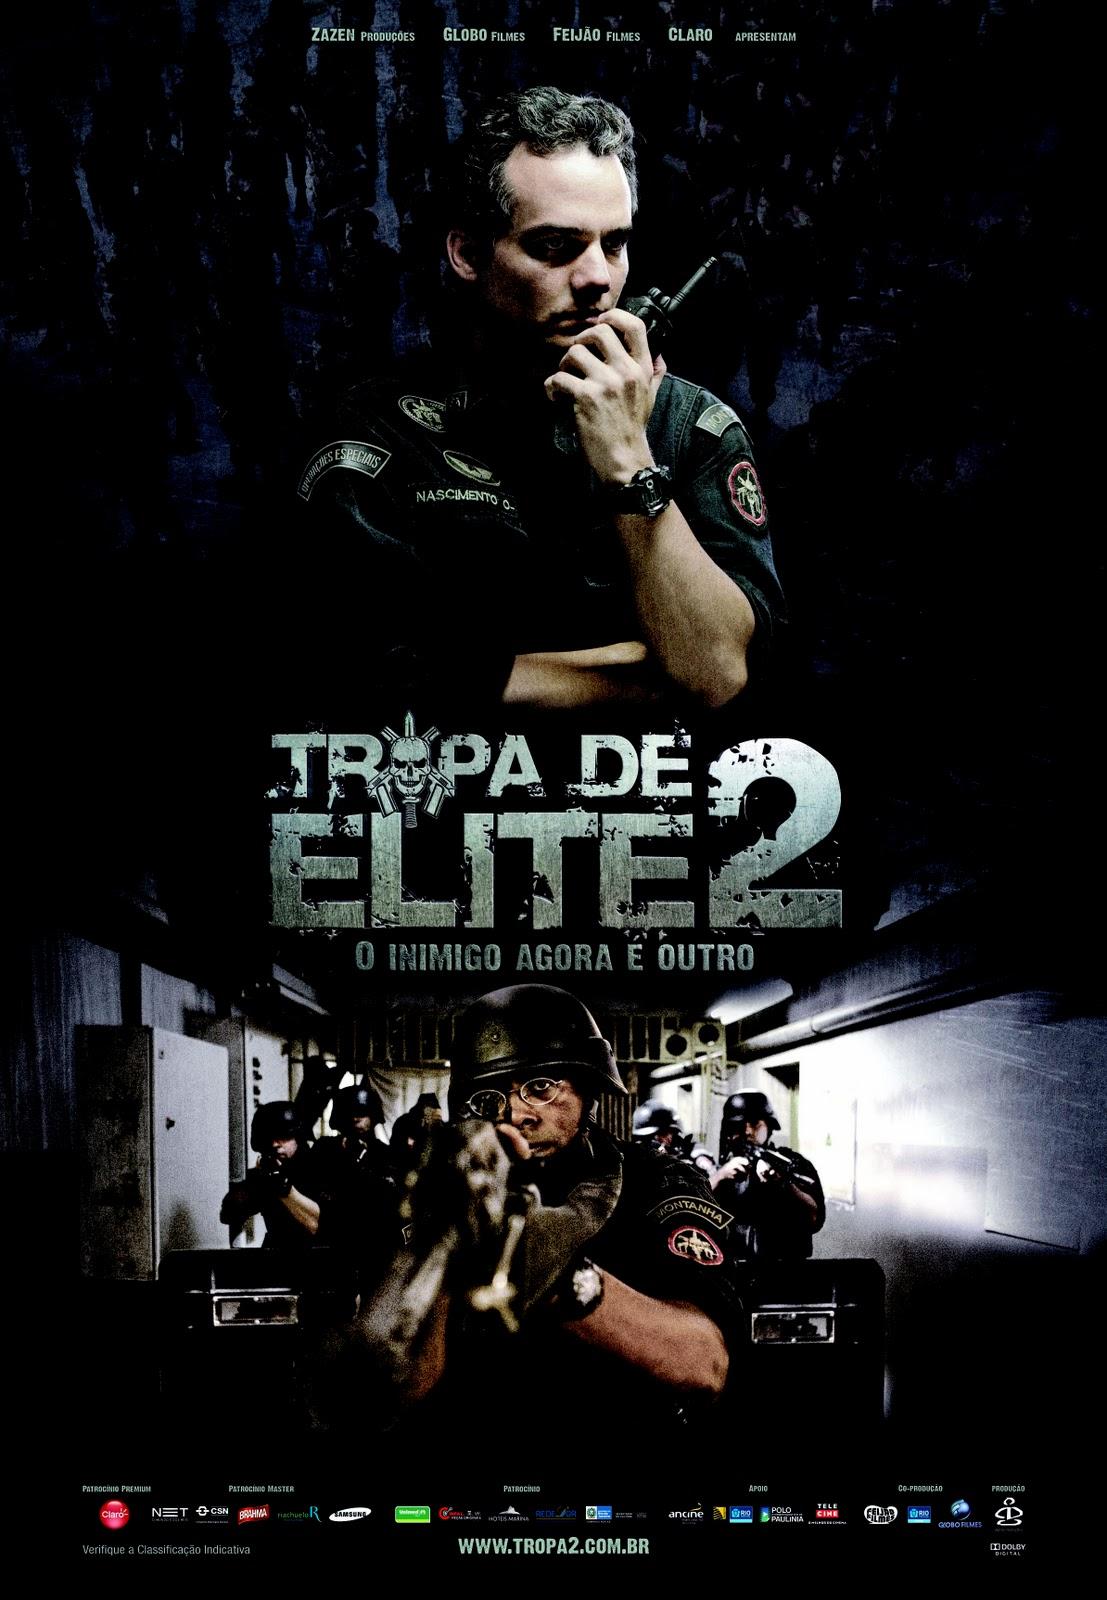 http://3.bp.blogspot.com/-Ujm8EceiYJE/TcJCUO7W2JI/AAAAAAAABiA/0XaT-F4hG78/s1600/elite_squad_2.jpg